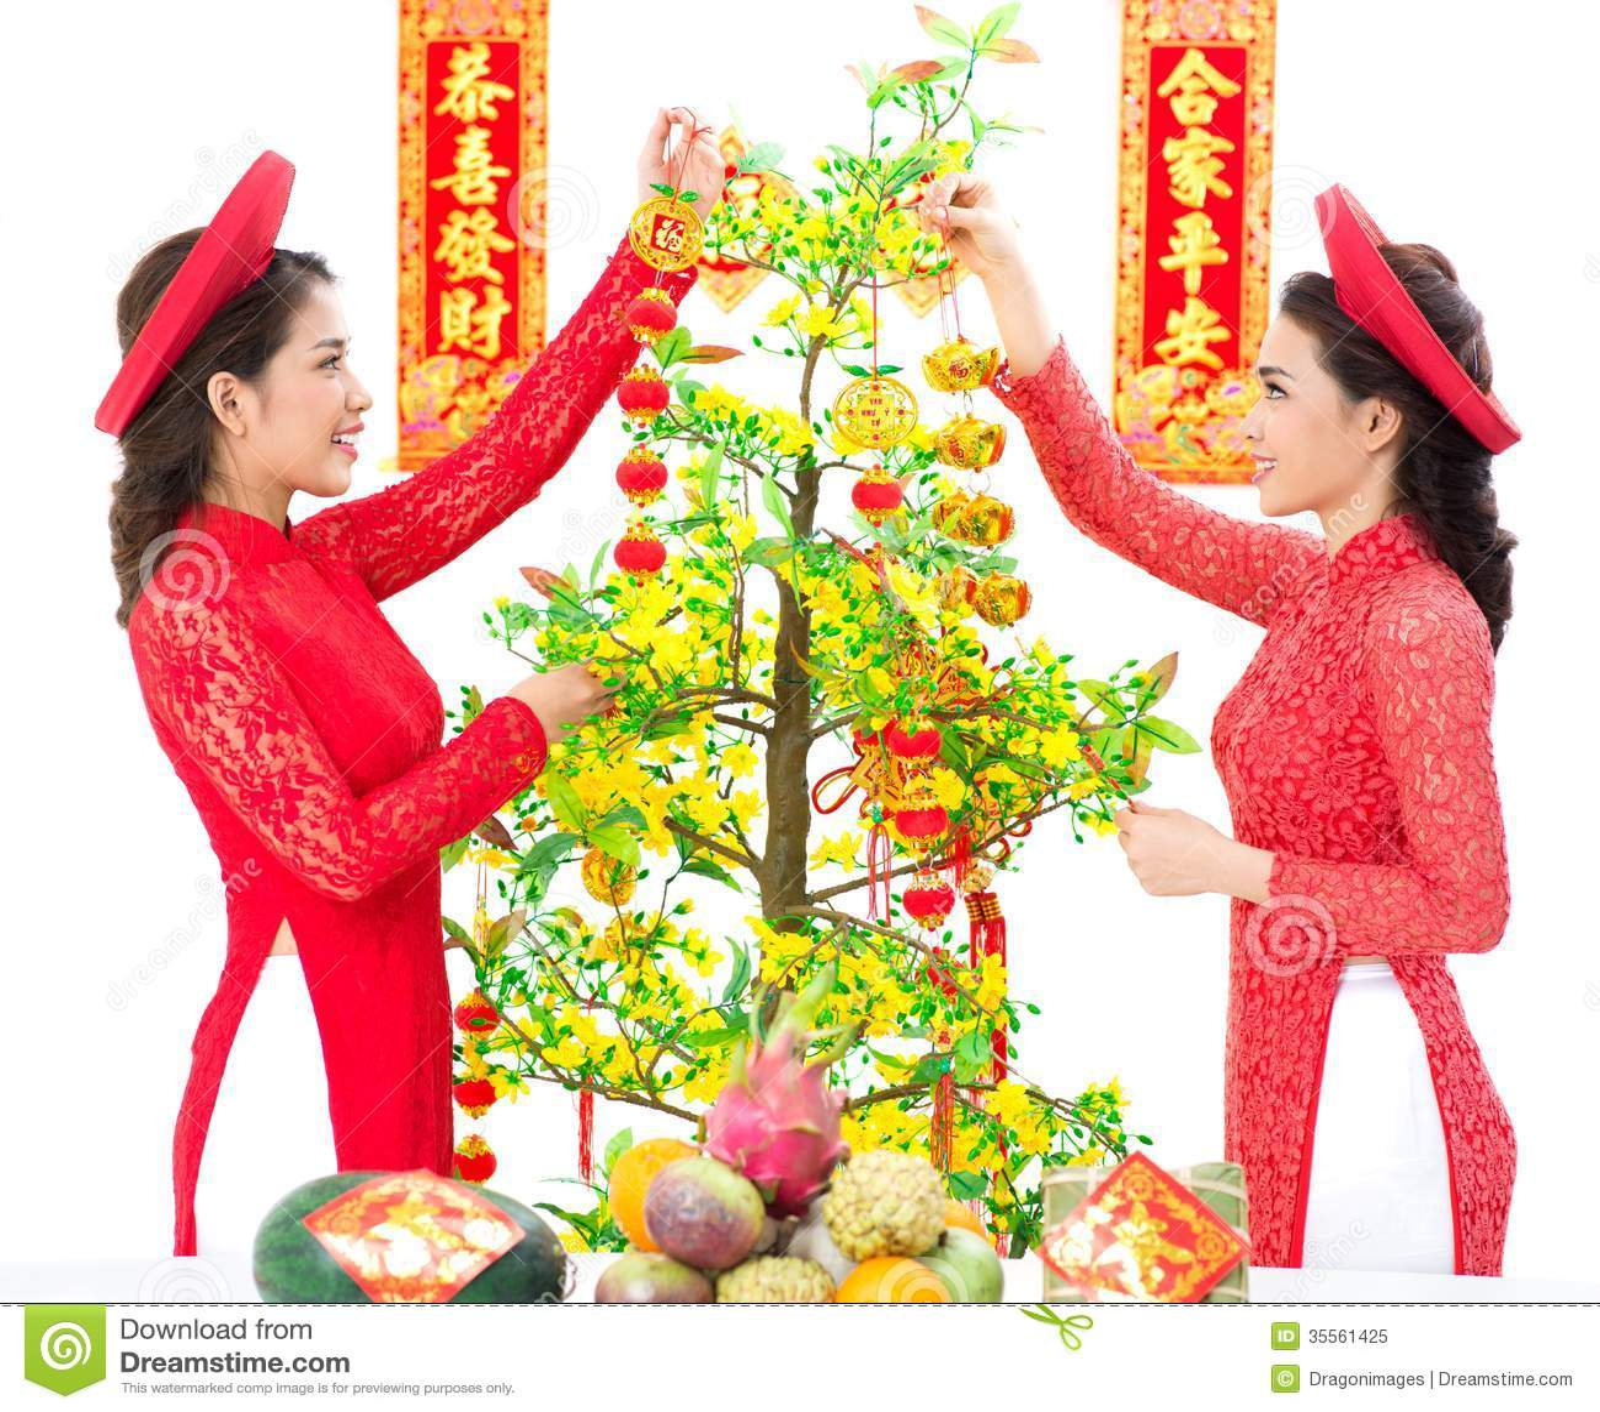 Hoa Mai Decoration Royalty Free Stock Photo - Image: 35561425